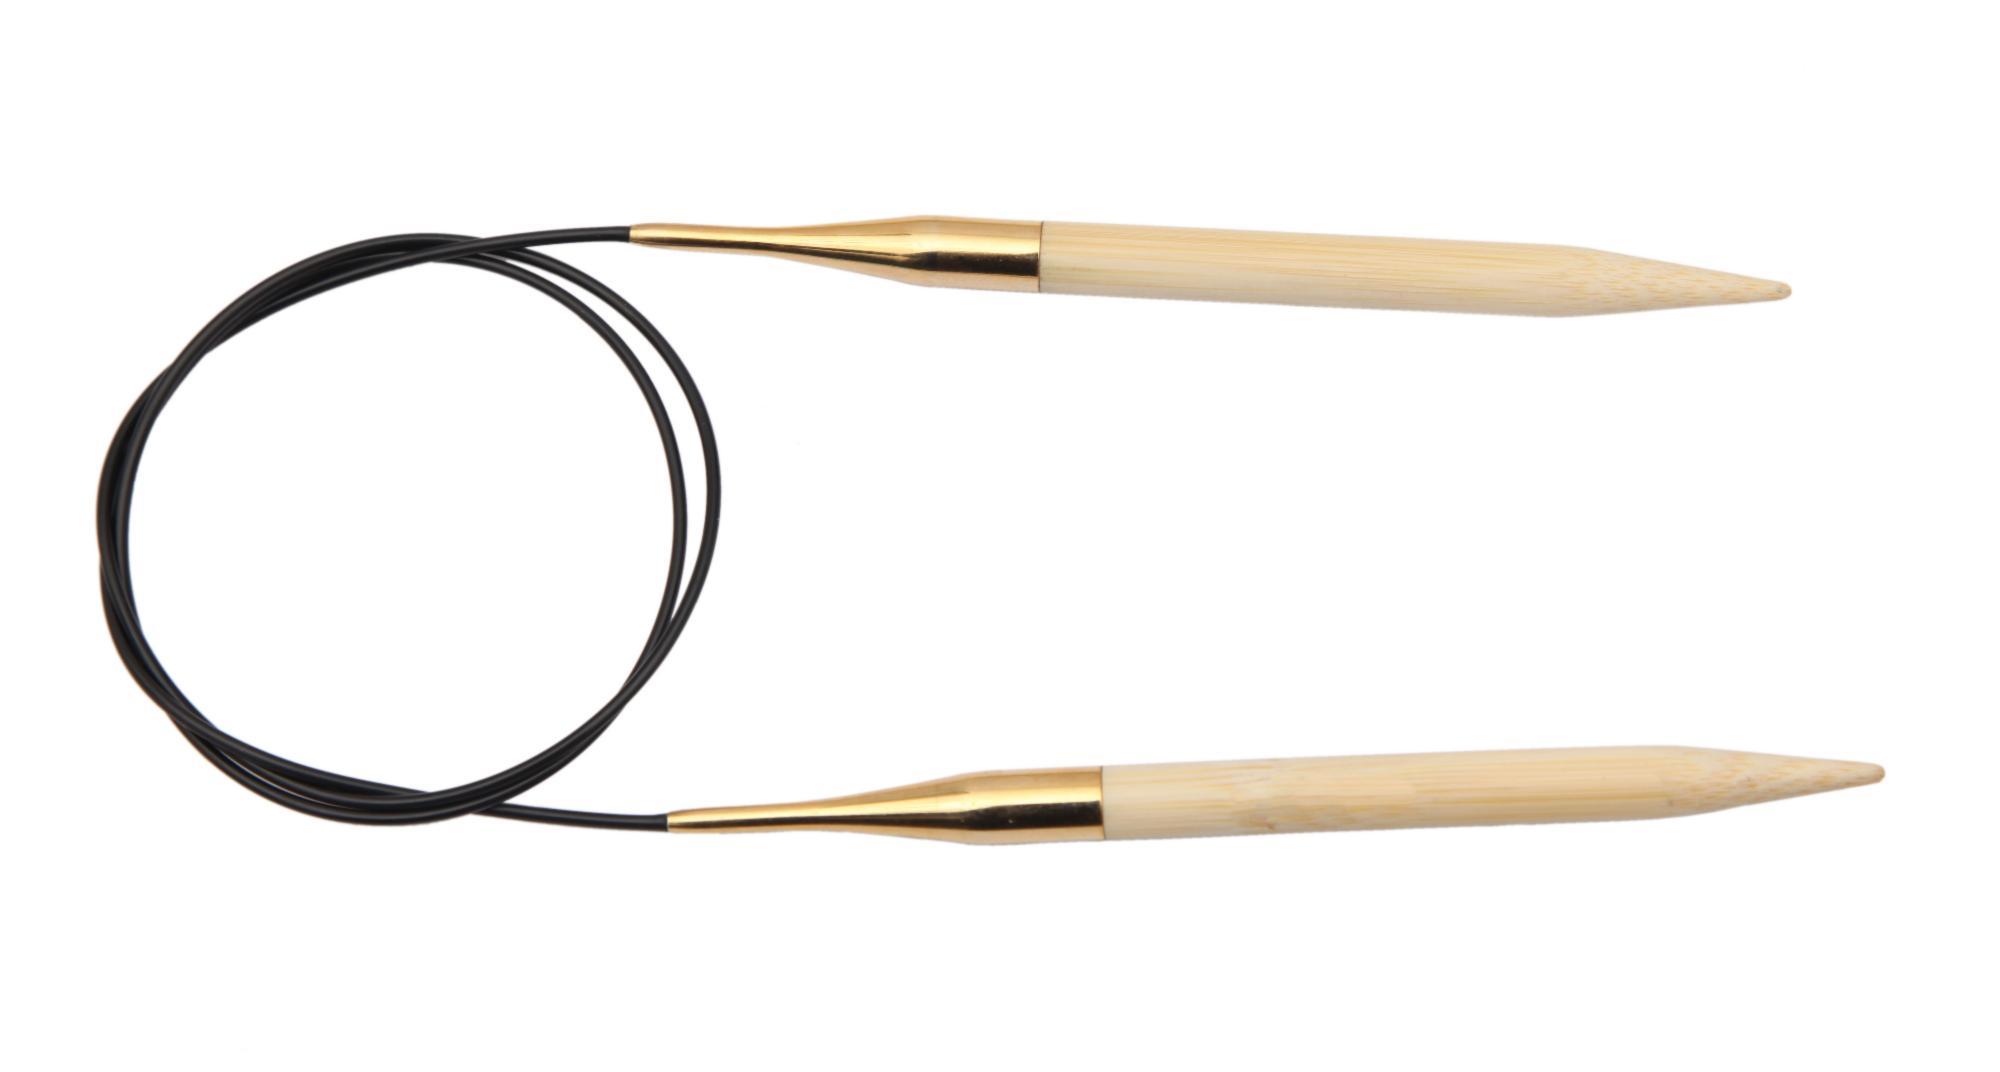 Спицы круговые 40 см Bamboo KnitPro, 22207, 4.00 мм